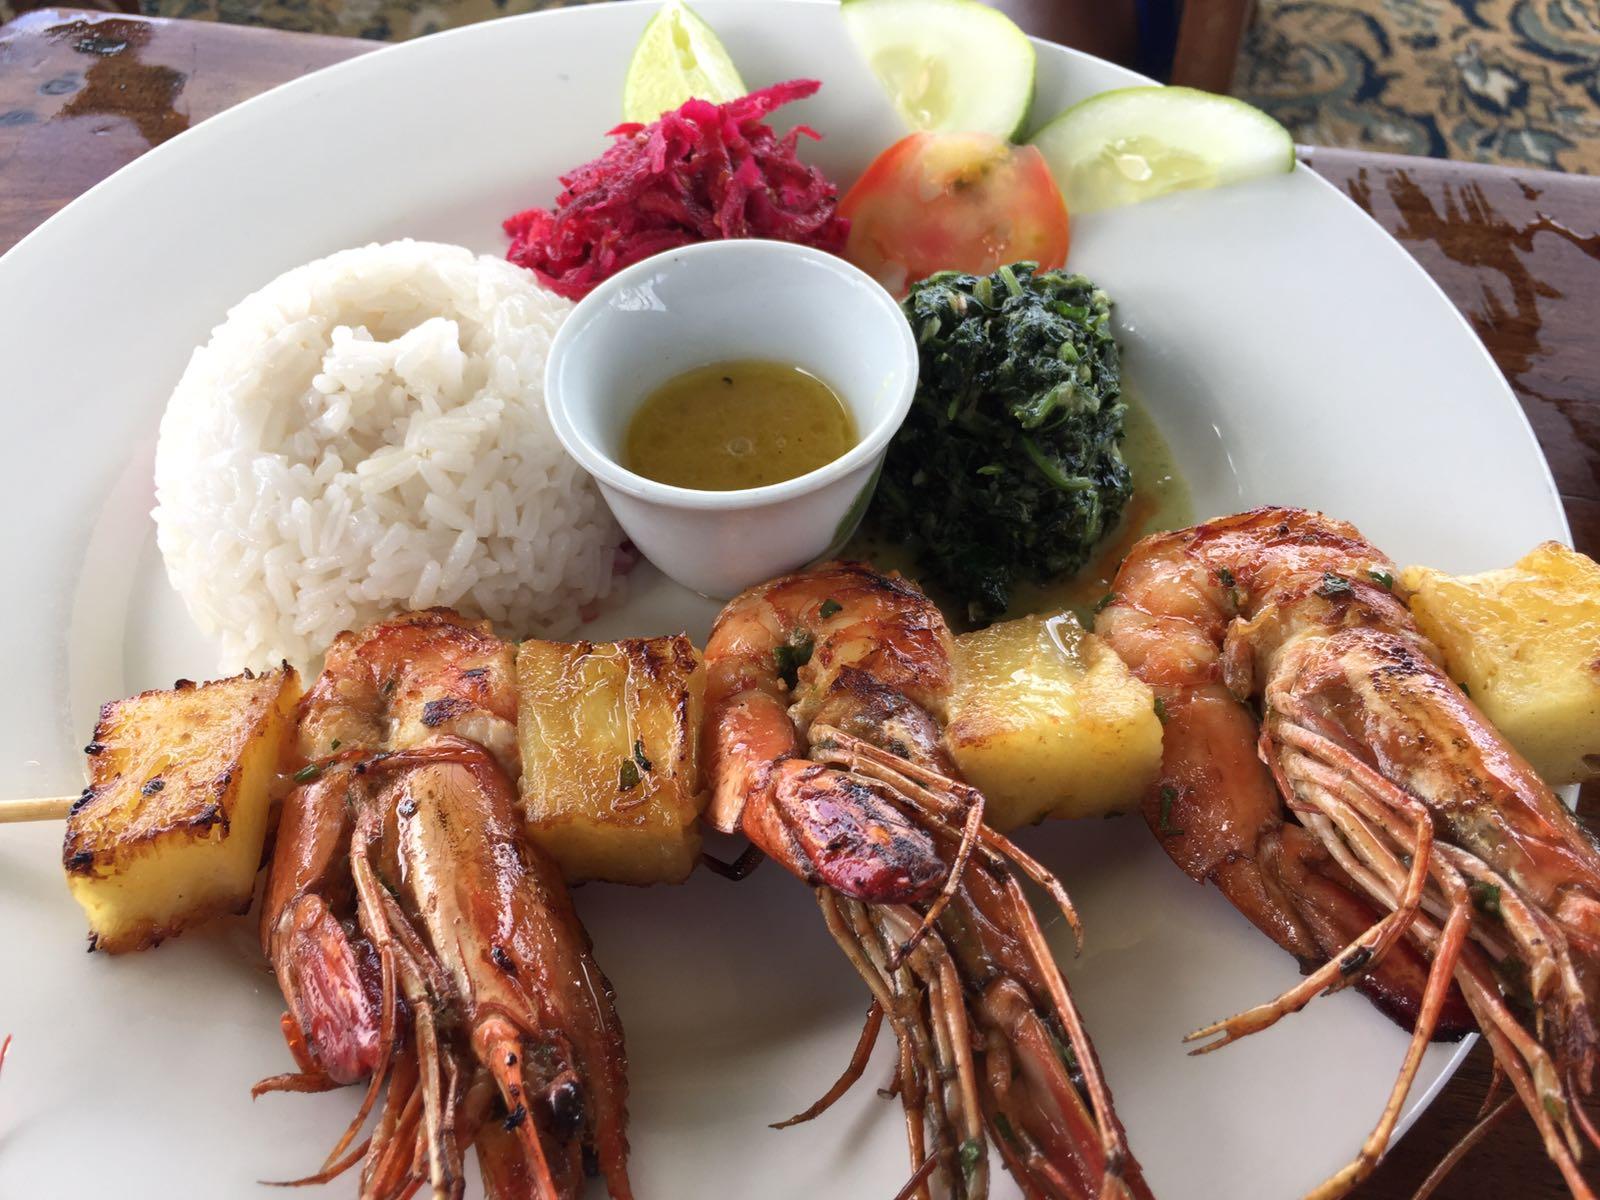 Food Tanzania 1.JPG